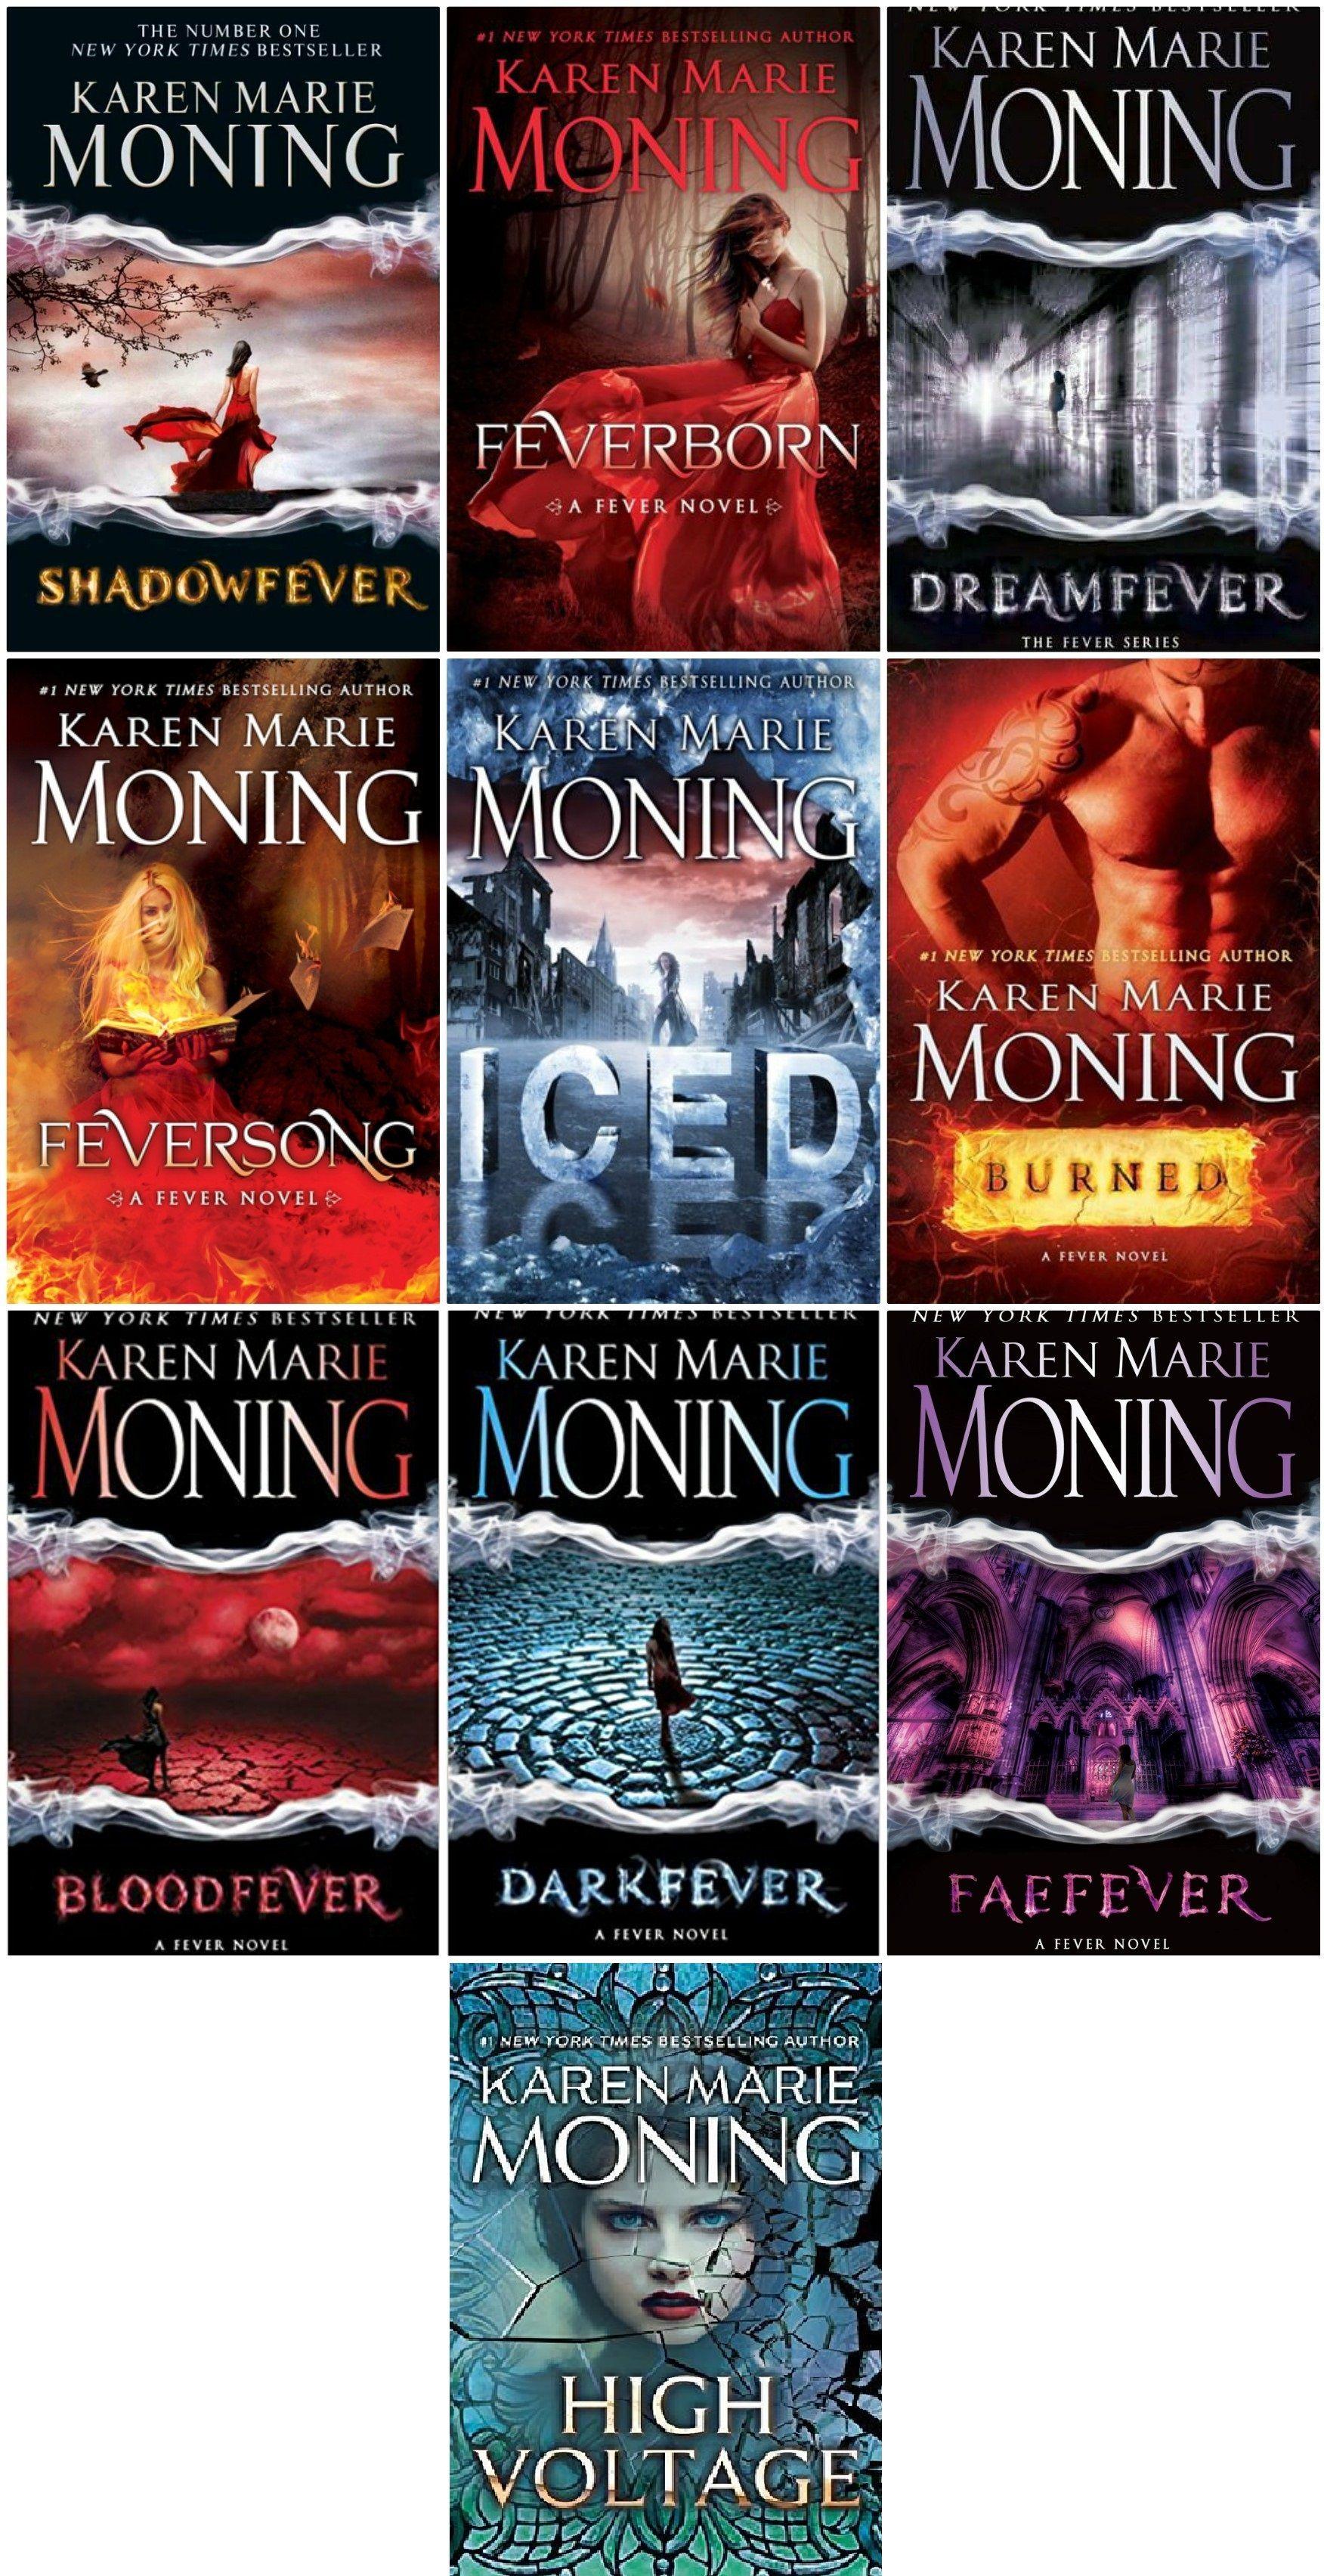 Fever series by karen marie moning divine ebooks pinterest fever series by karen marie moning fandeluxe Gallery